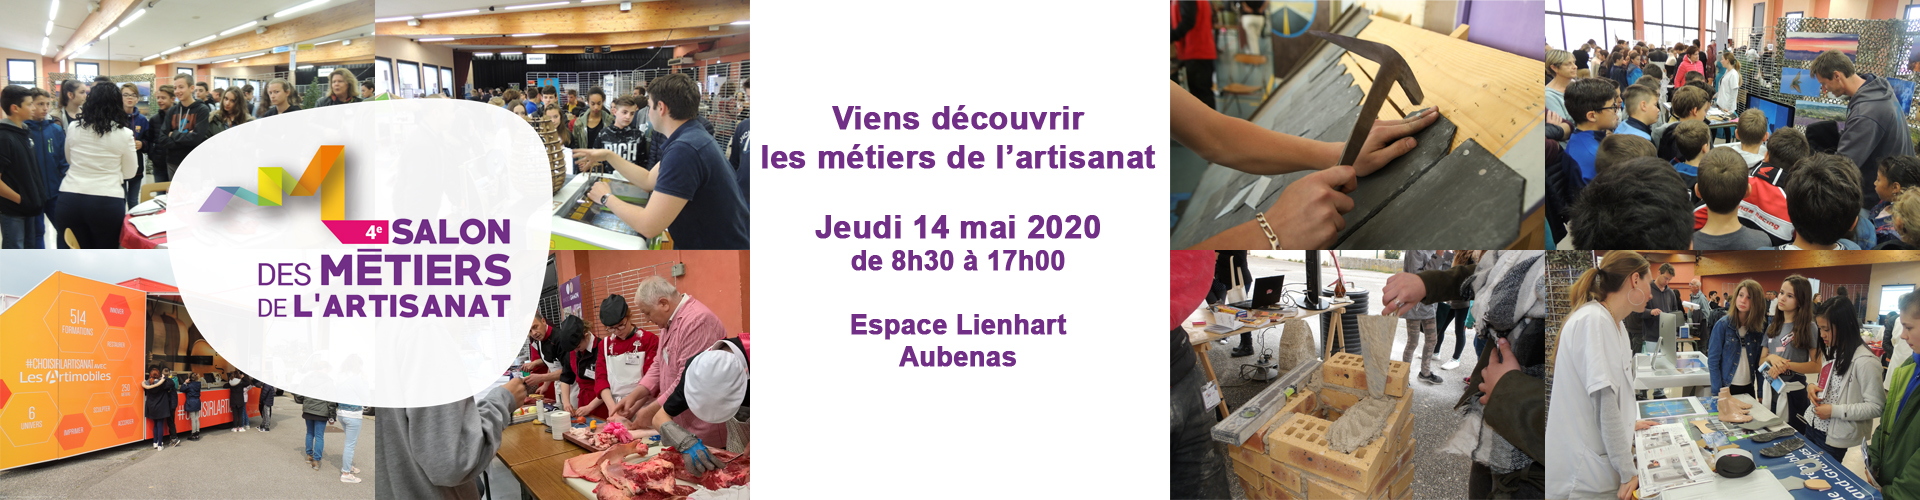 Salon_metiers_artisanat_2020